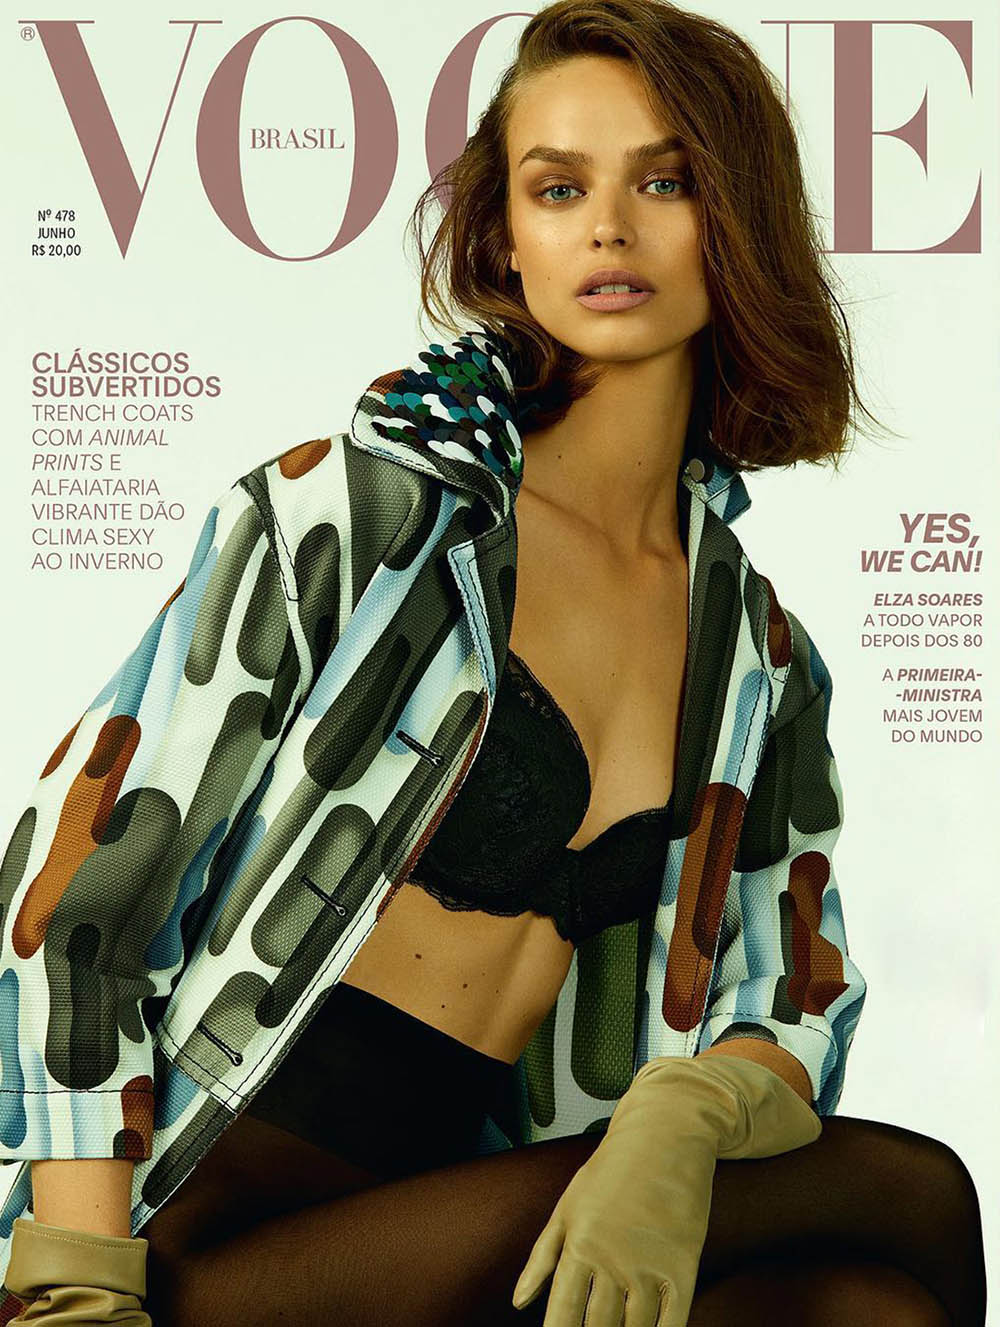 Birgit Kos covers Vogue Brazil June 2018 by Mariana Maltoni